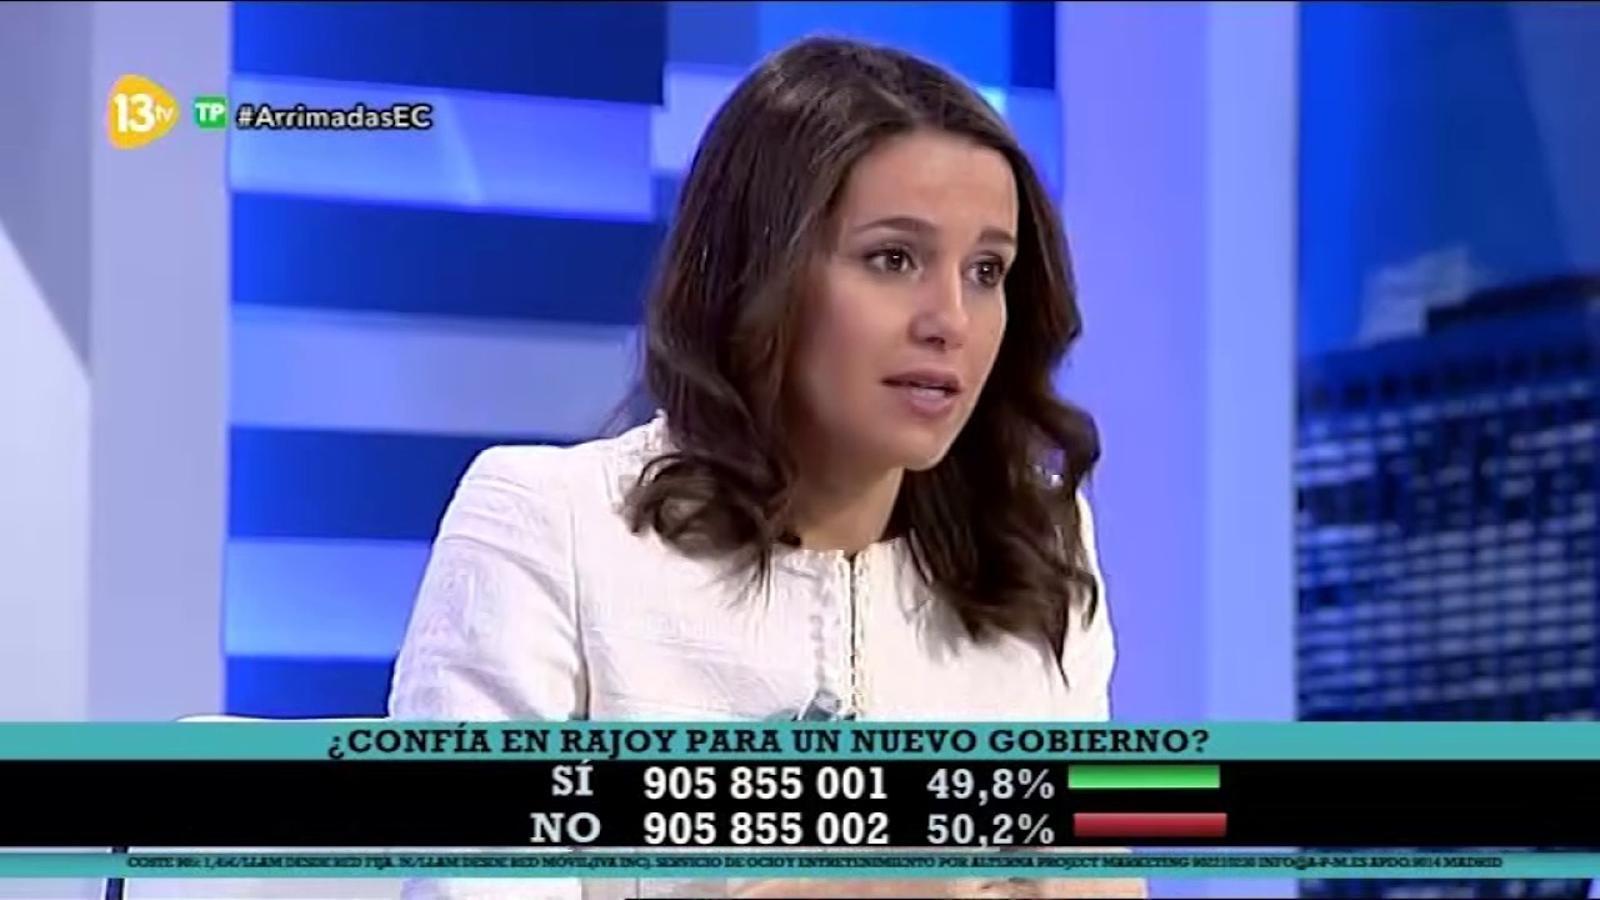 Entrevista d'Inés Arrimadas a 13TV (26/10/2016)